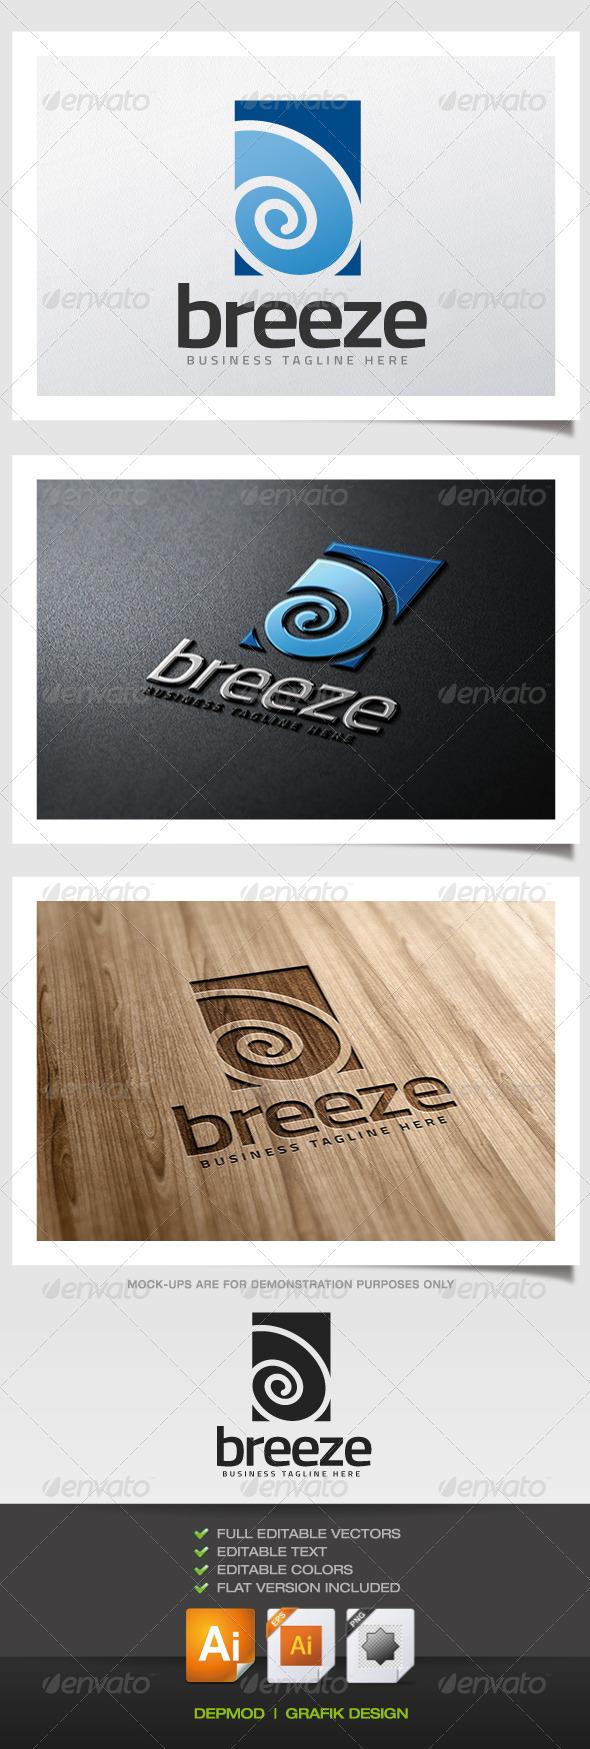 Breeze Logo - Abstract Logo Templates